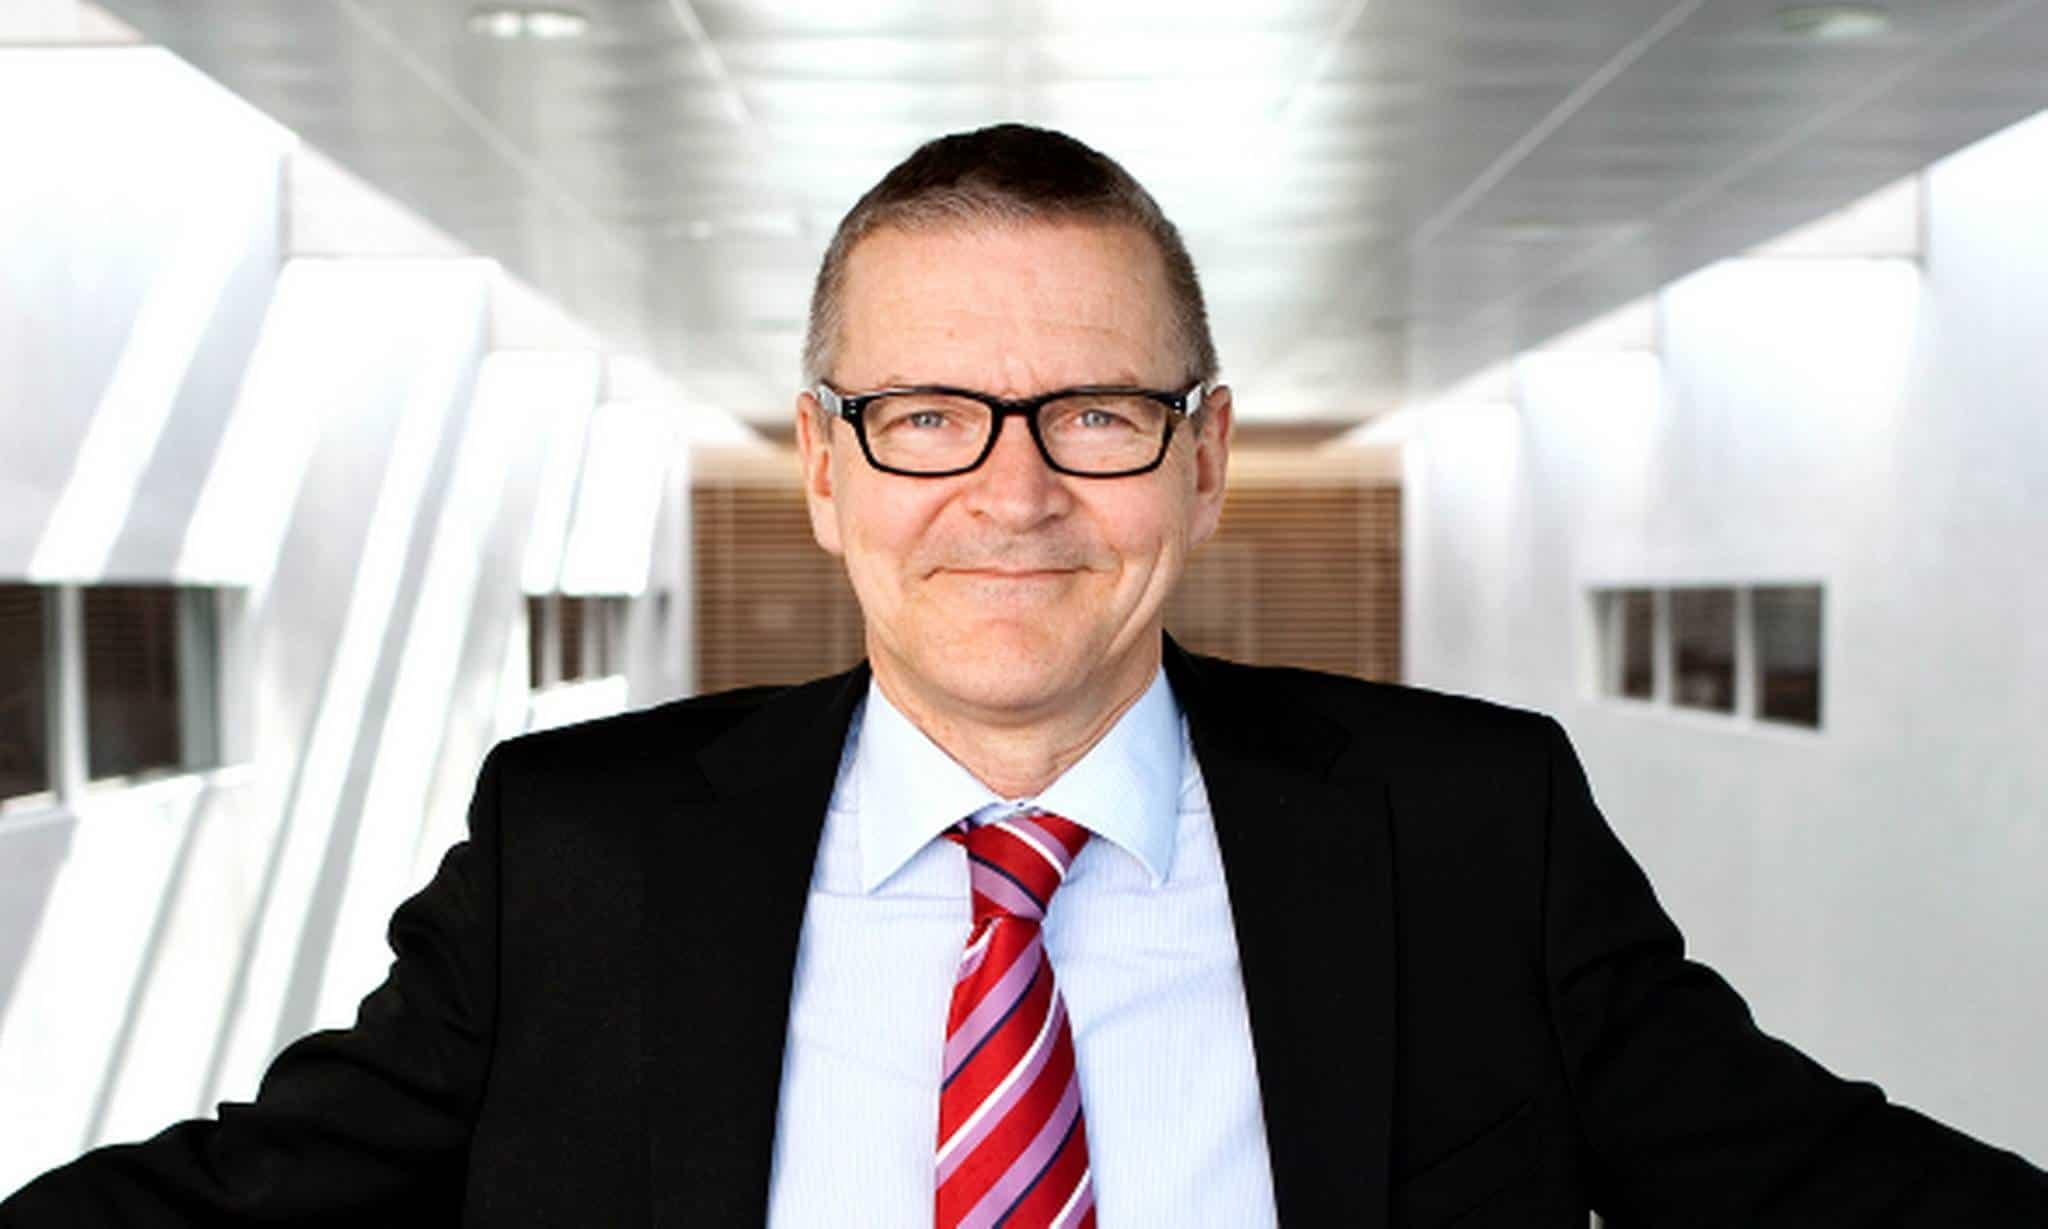 Lars Rohde. Source: FinansWatch